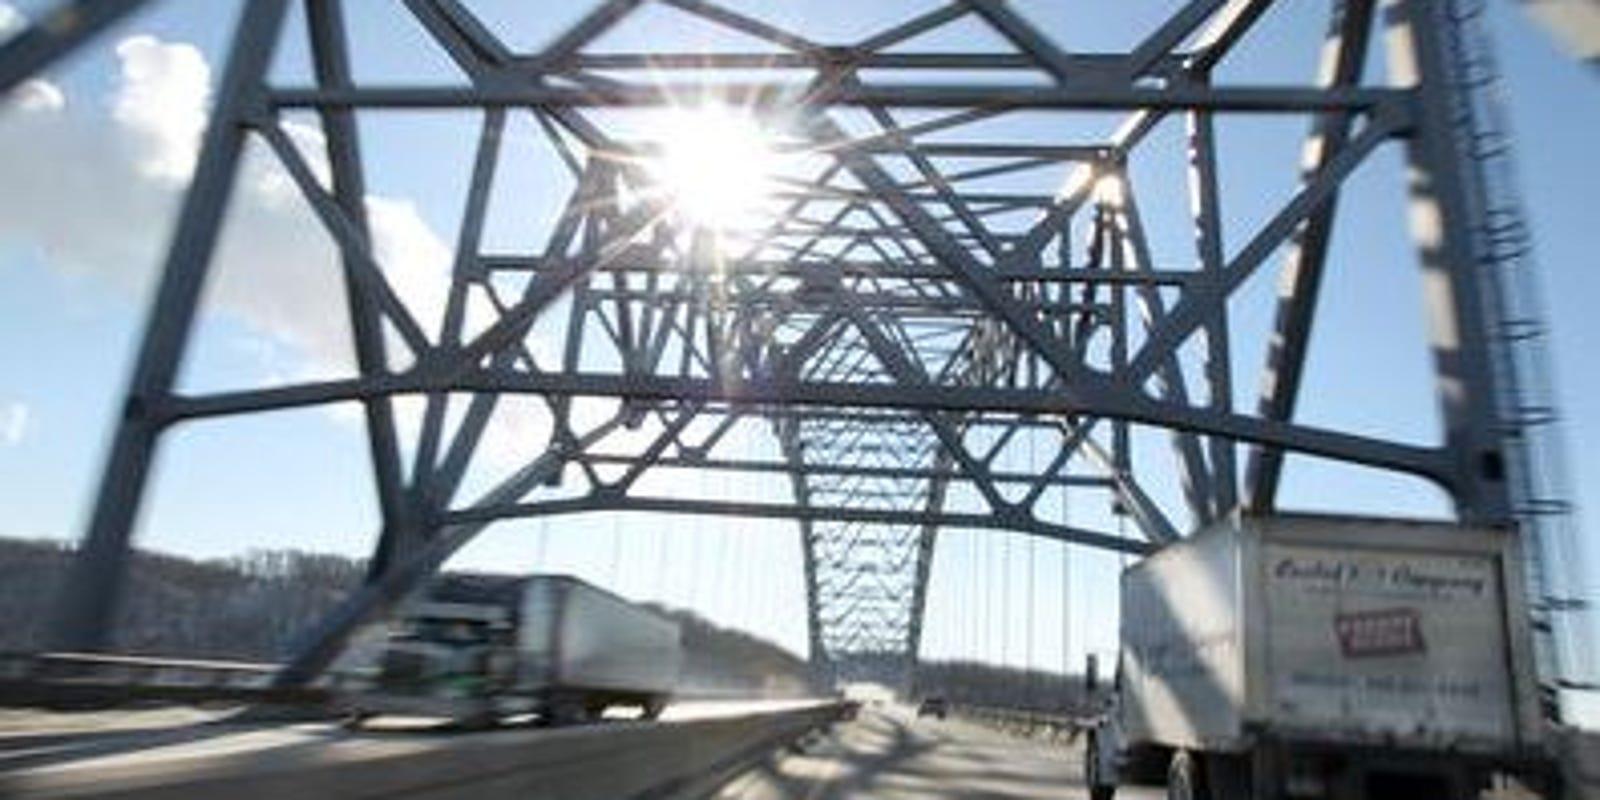 Coast Guard: Coal barge strikes I-275 Carroll Lee Cropper Bridge in NKY